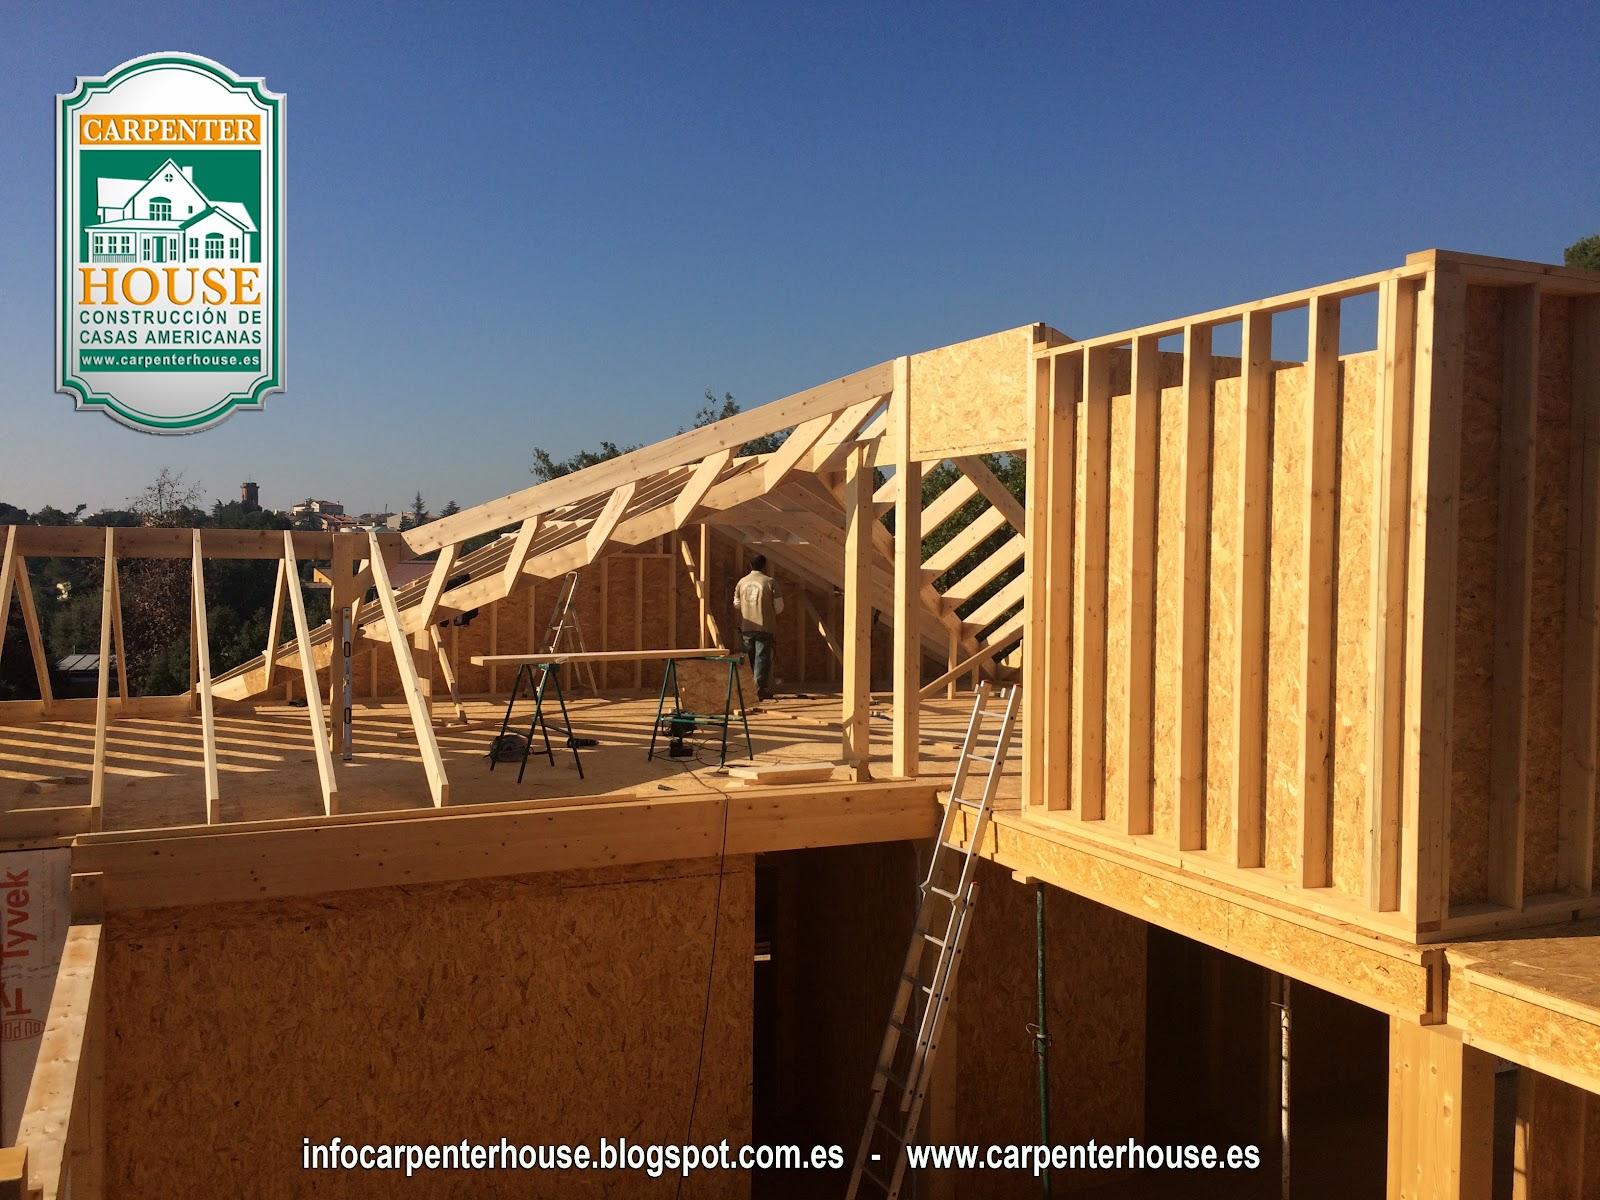 Carpenter house 4 fase construcci n casa en el vall s - Casas en valles occidental ...